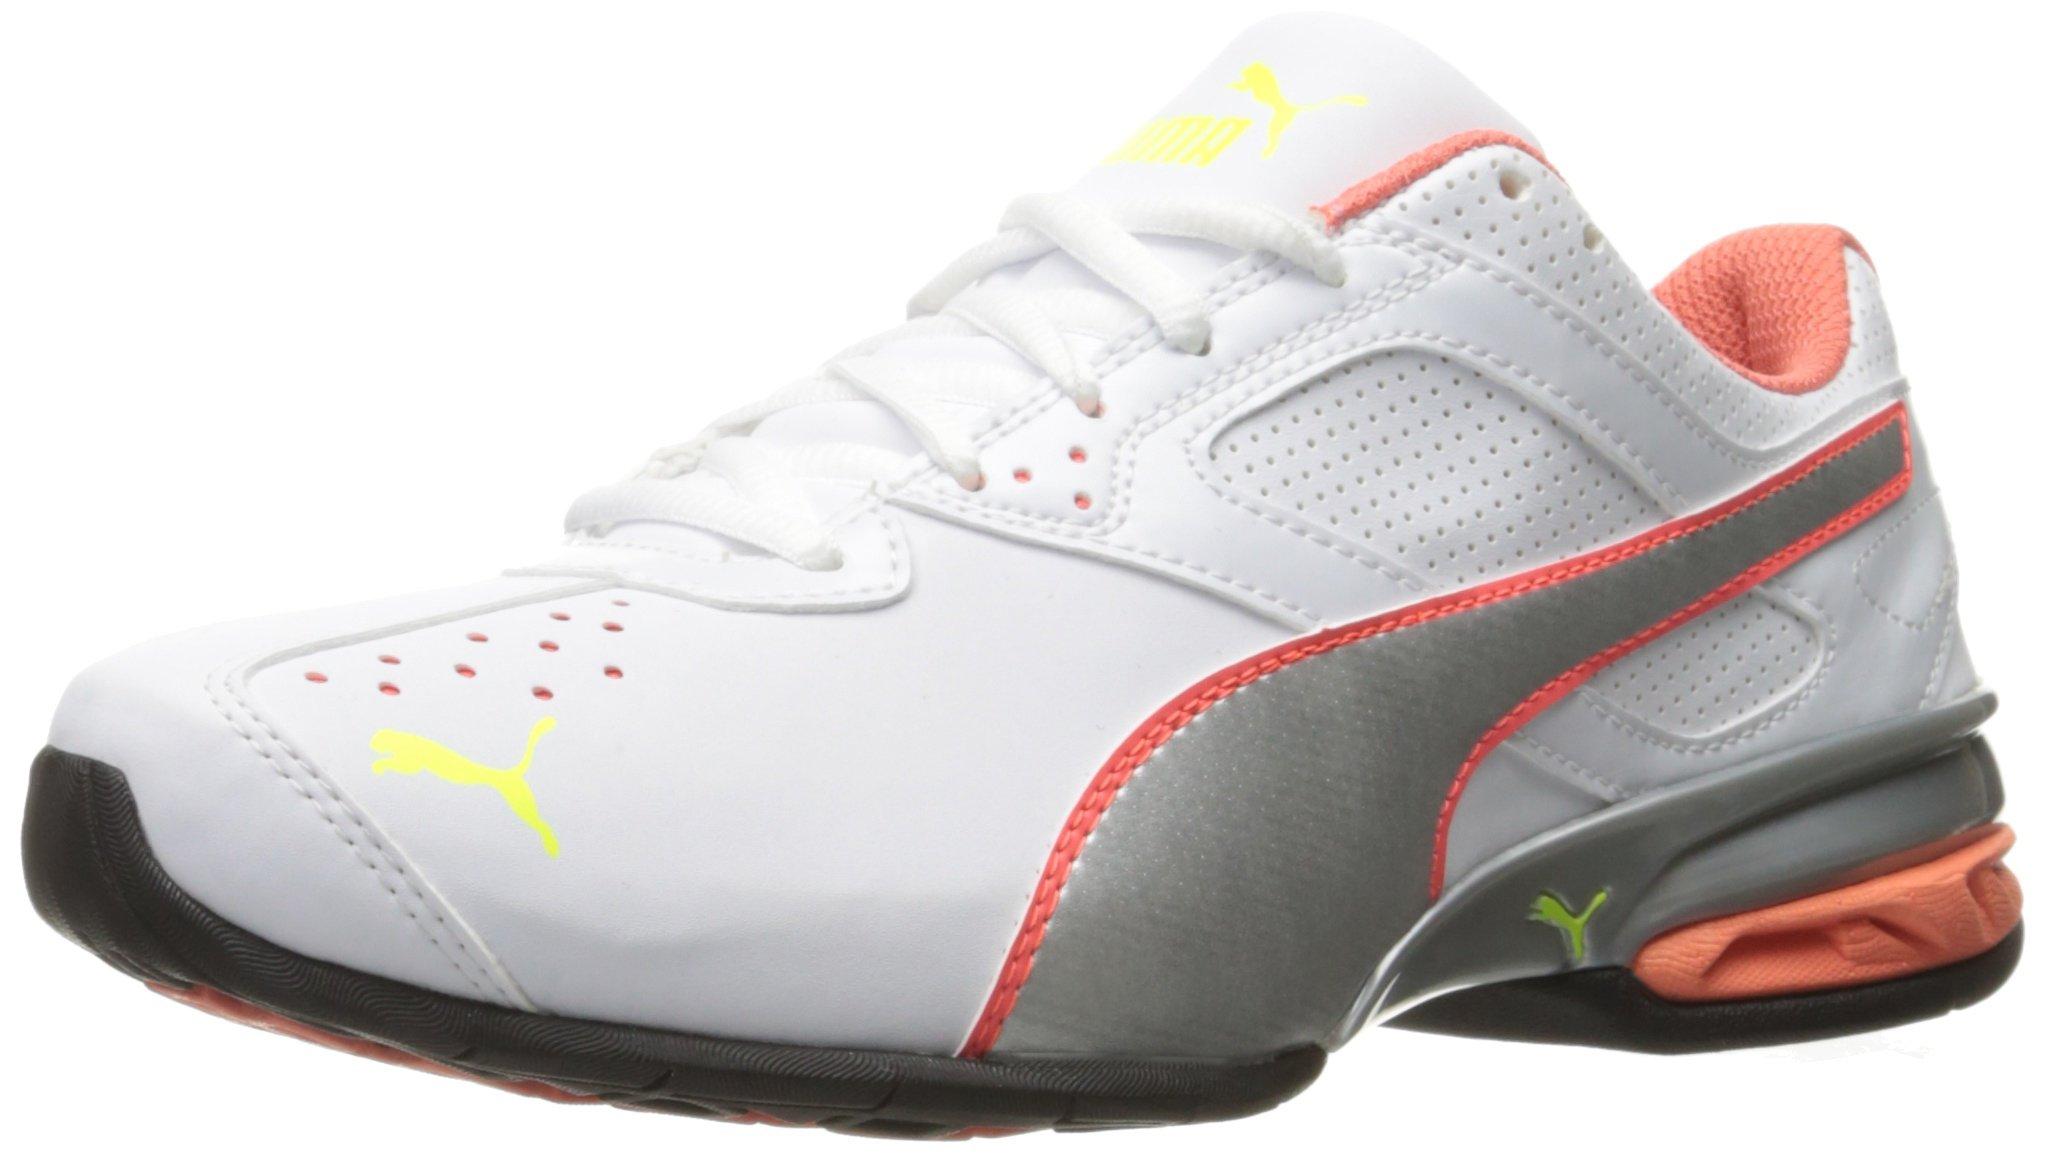 f0cfd63d3db Galleon - PUMA Women s Tazon 6 WN s FM Cross-Trainer Shoe